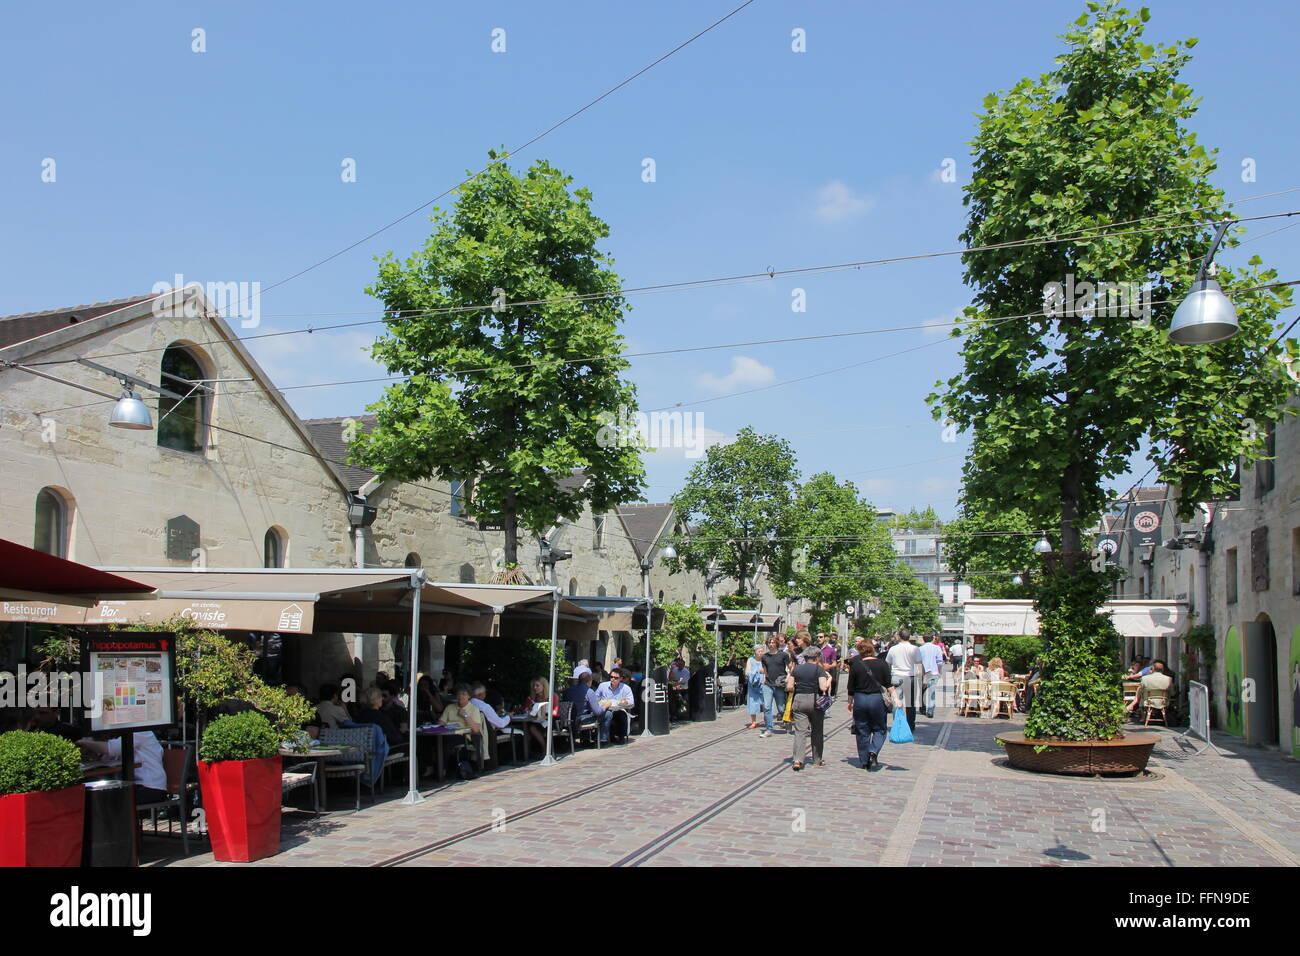 geography / travel, France, Pairs, Bercy Village, Cour Saint-Emilion, - Stock Image